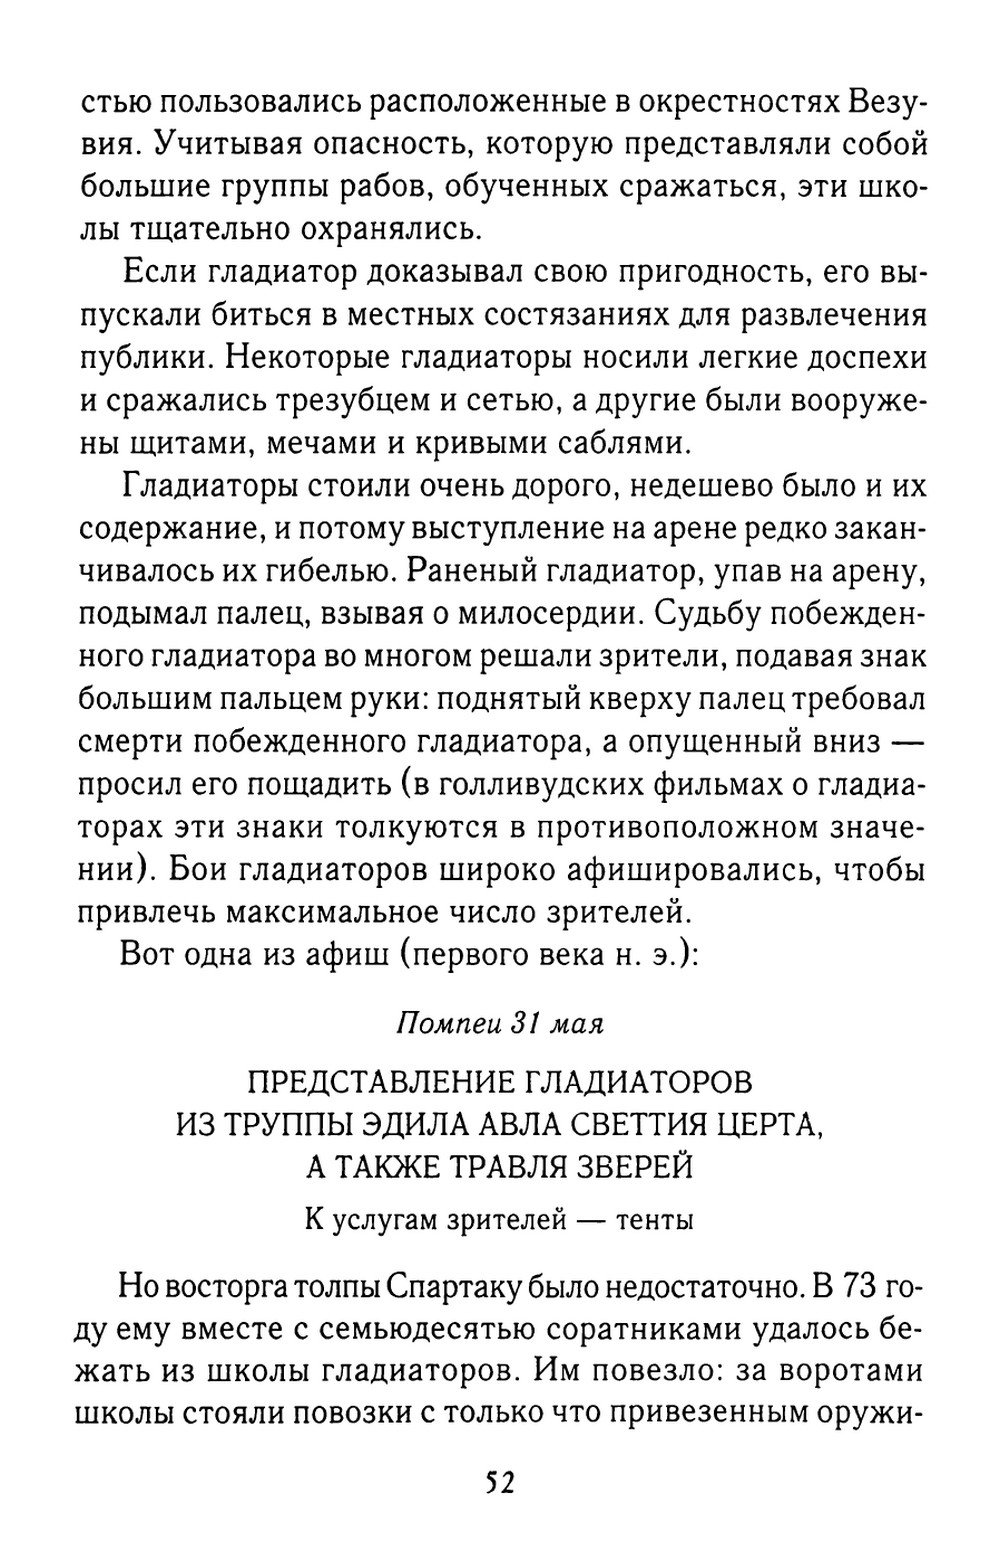 http://i5.imageban.ru/out/2013/10/02/46ba4b714ddc59abf8e19b54e986dc7d.jpg